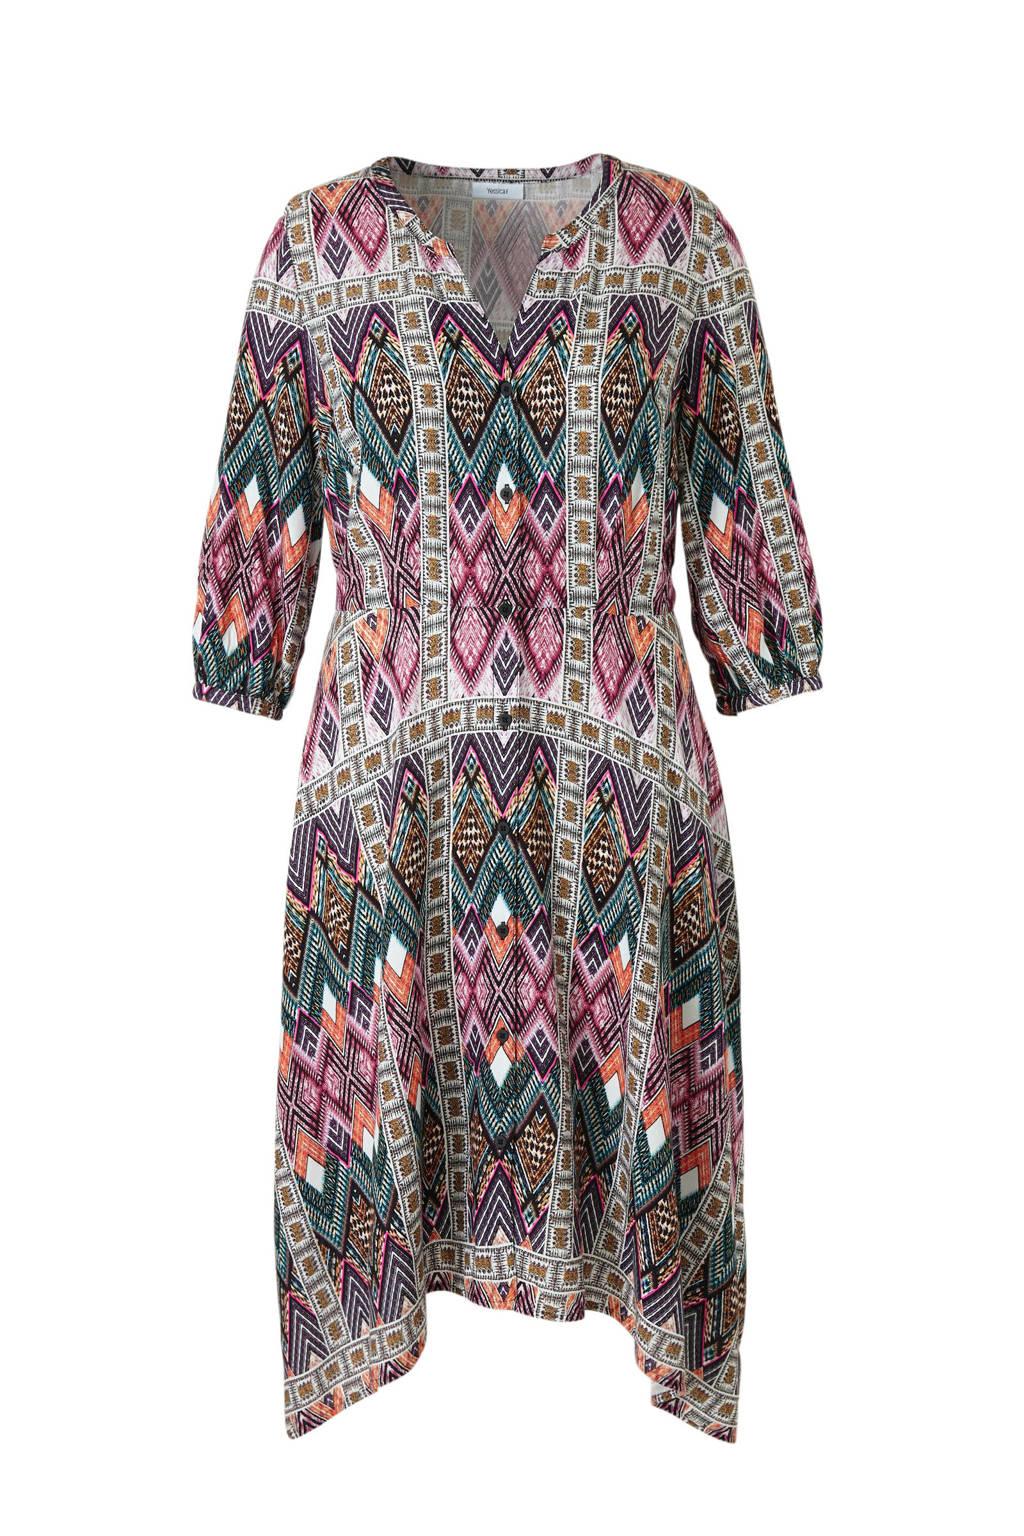 C&A XL Yessica jurk met grafische print roze/turquoise/oranje, Roze/turquoise/oranje